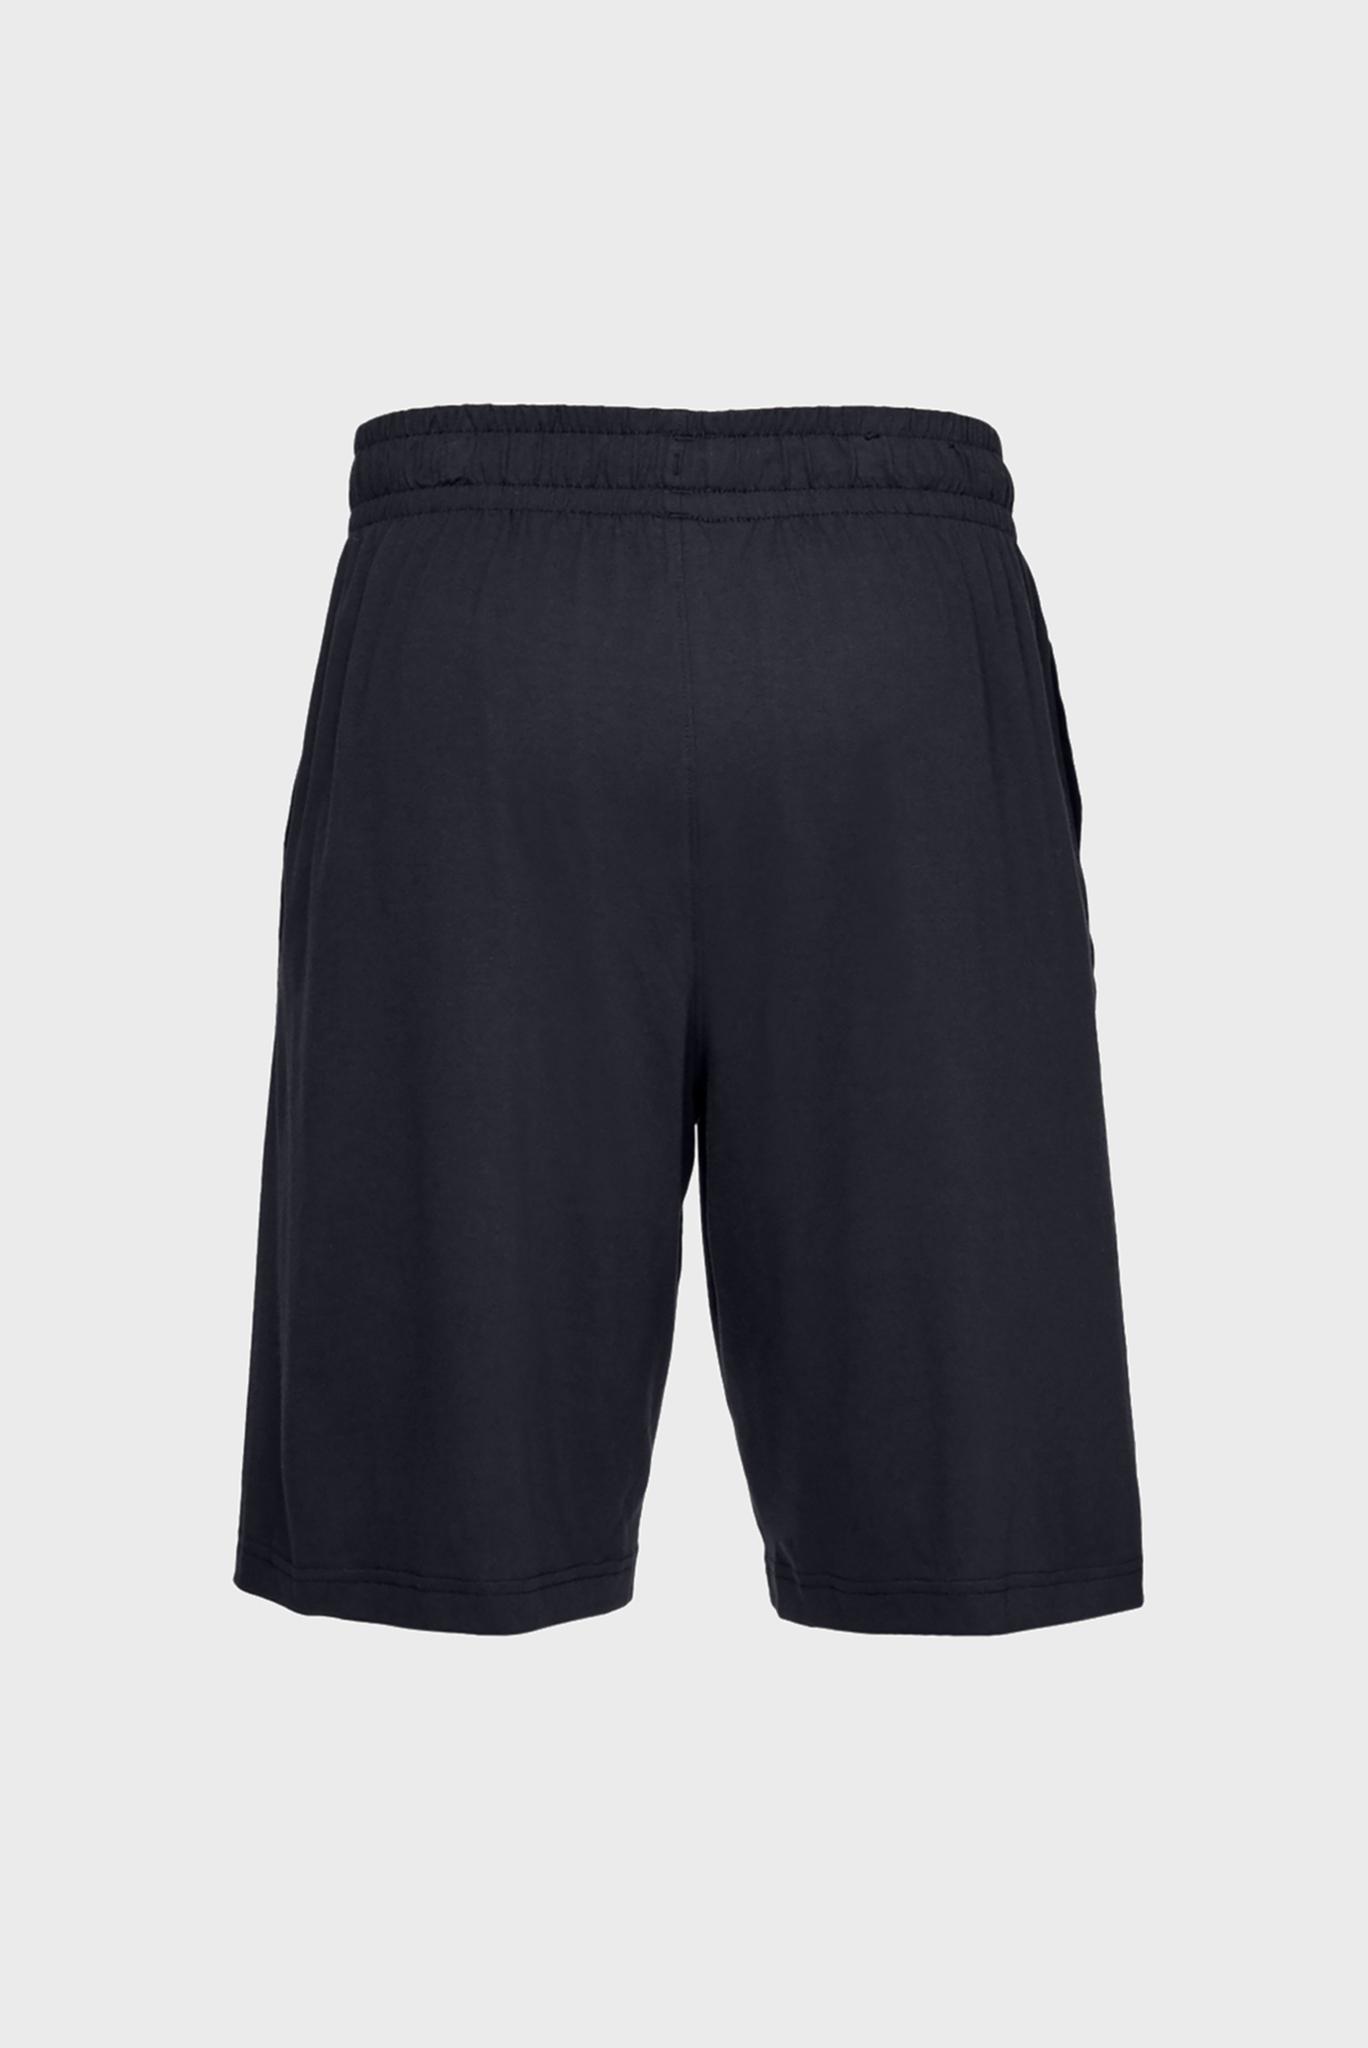 Мужские черные шорты SPORTSTYLE COTTON SHORT Under Armour